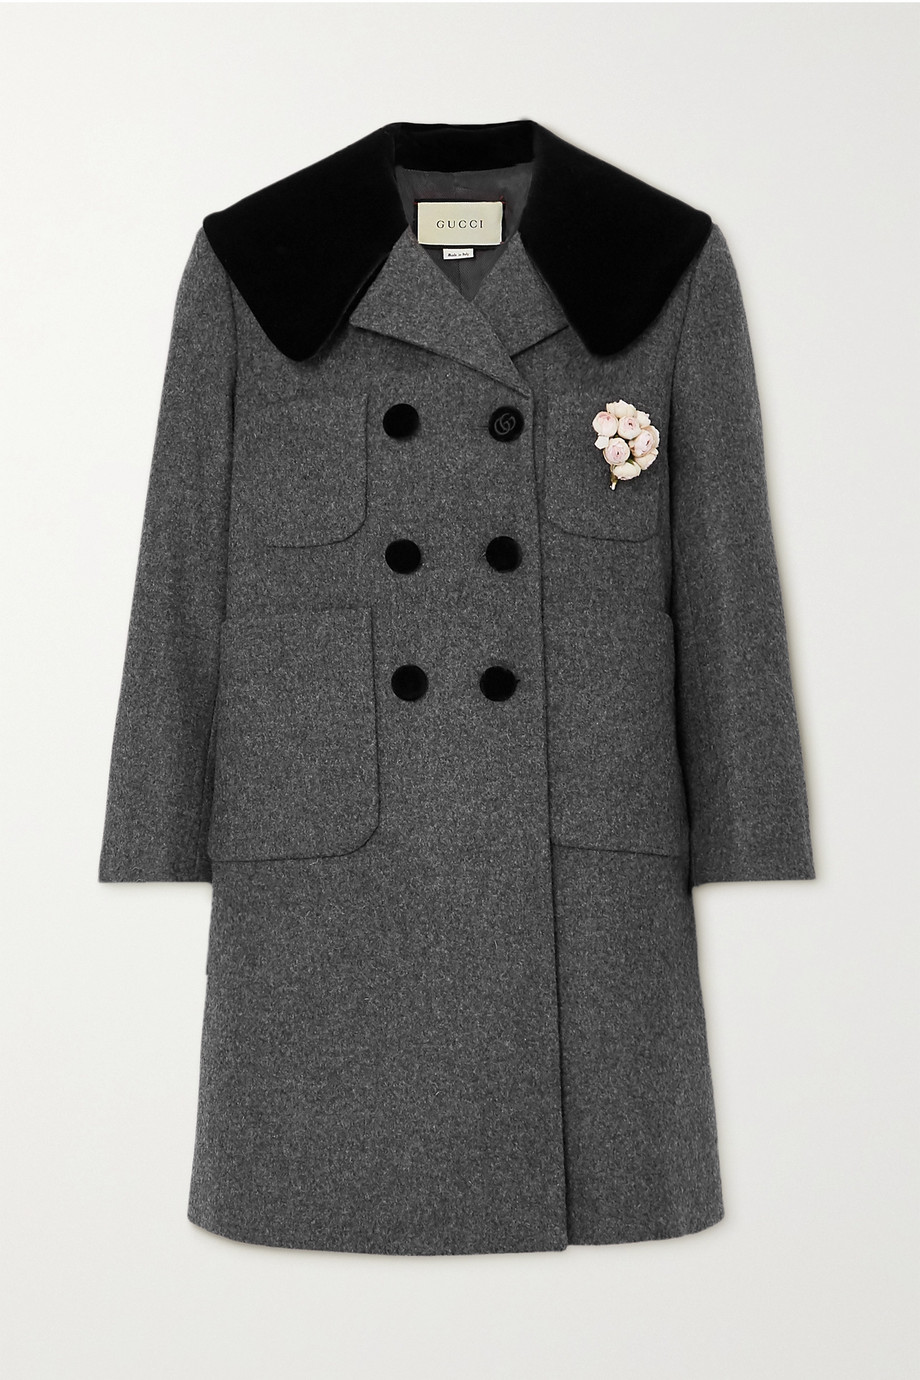 Gucci Embellished double-breasted velvet-trimmed wool coat